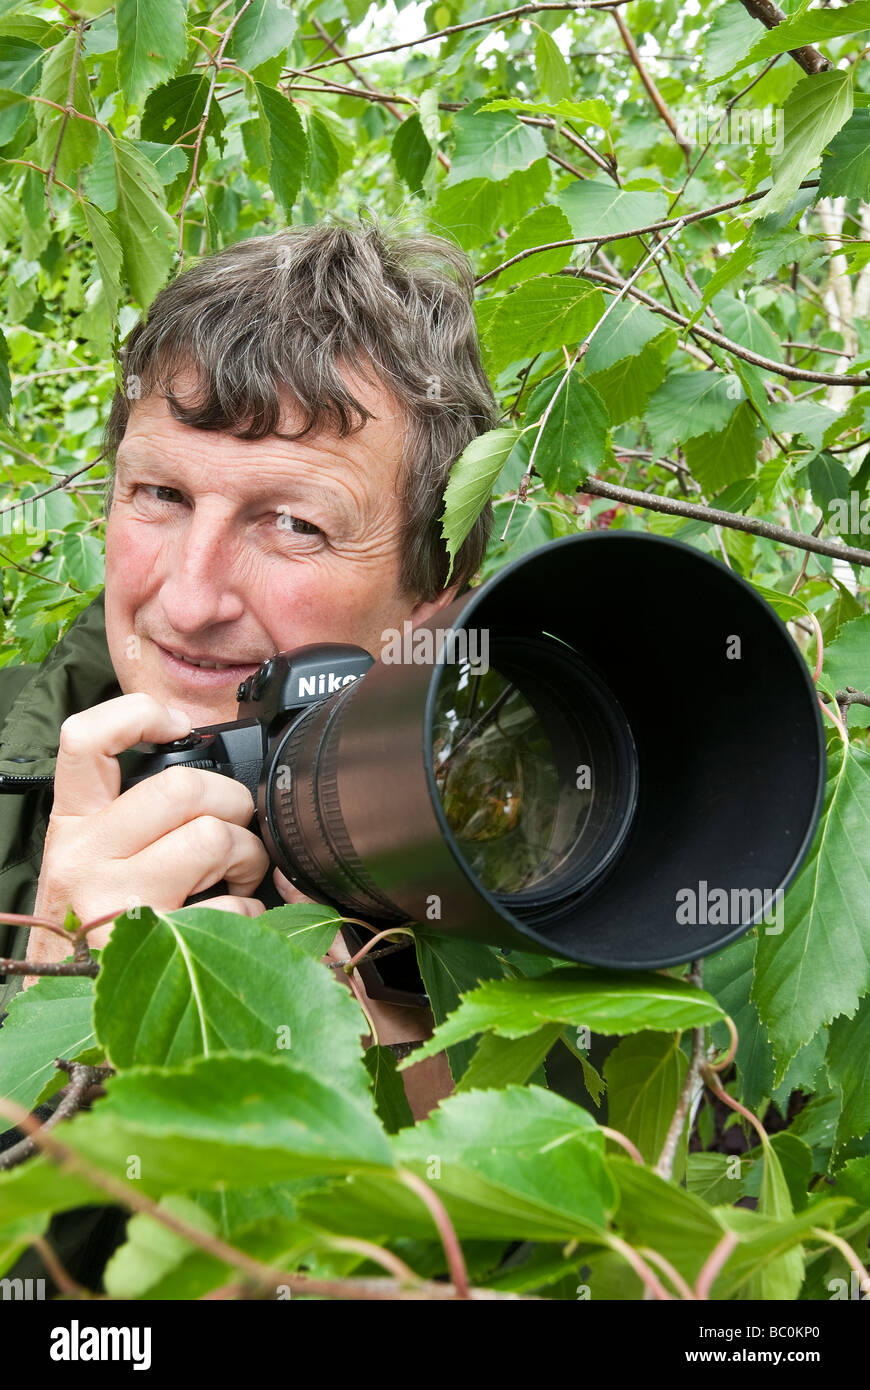 A wildlife photographer. - Stock Image